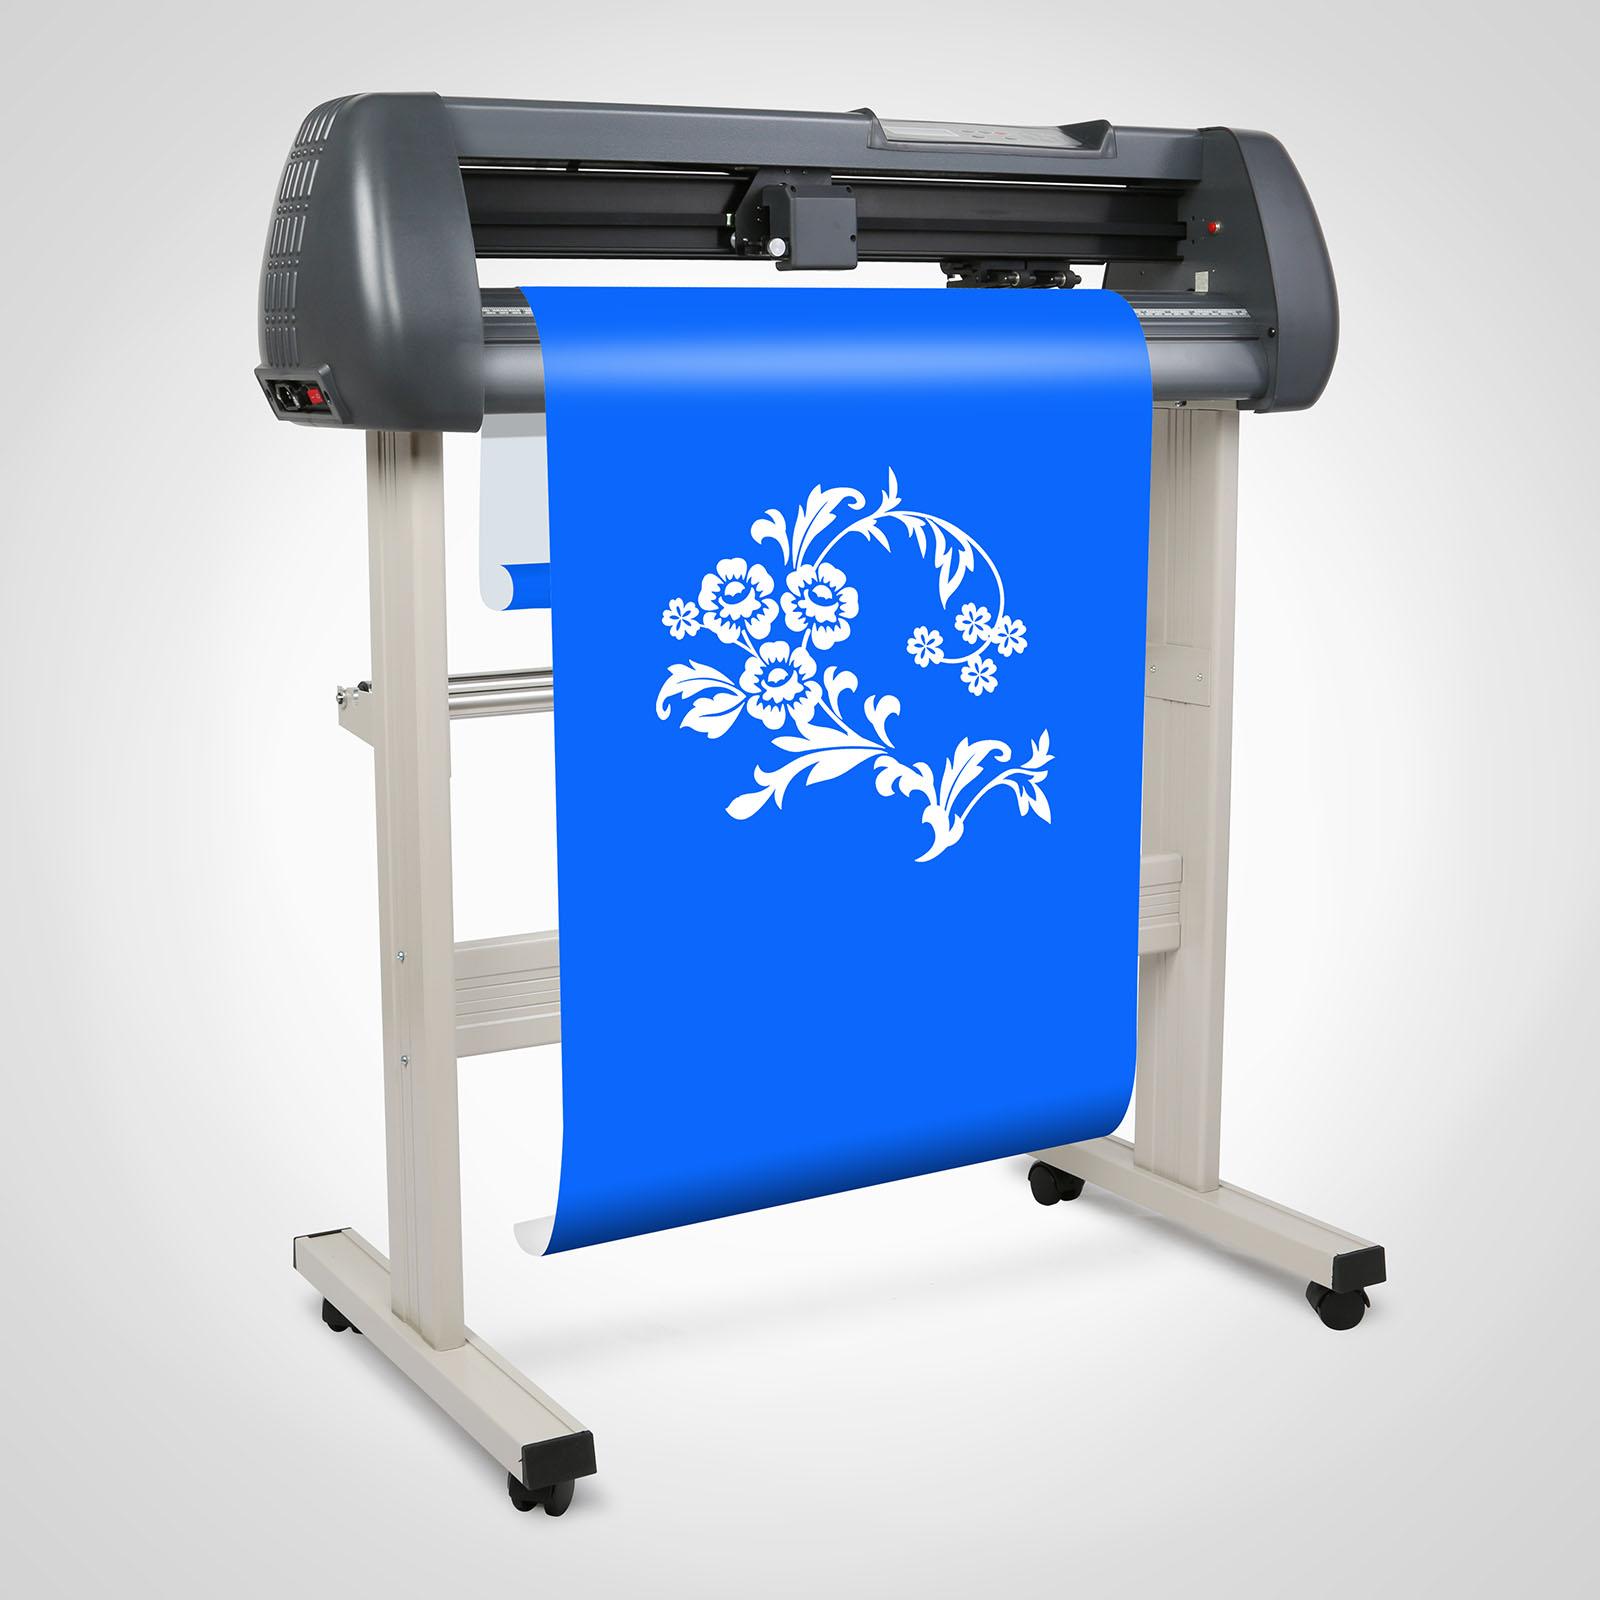 5in1 Heat Press Transfer 28 Quot Vinyl Cutting Plotter Sticker